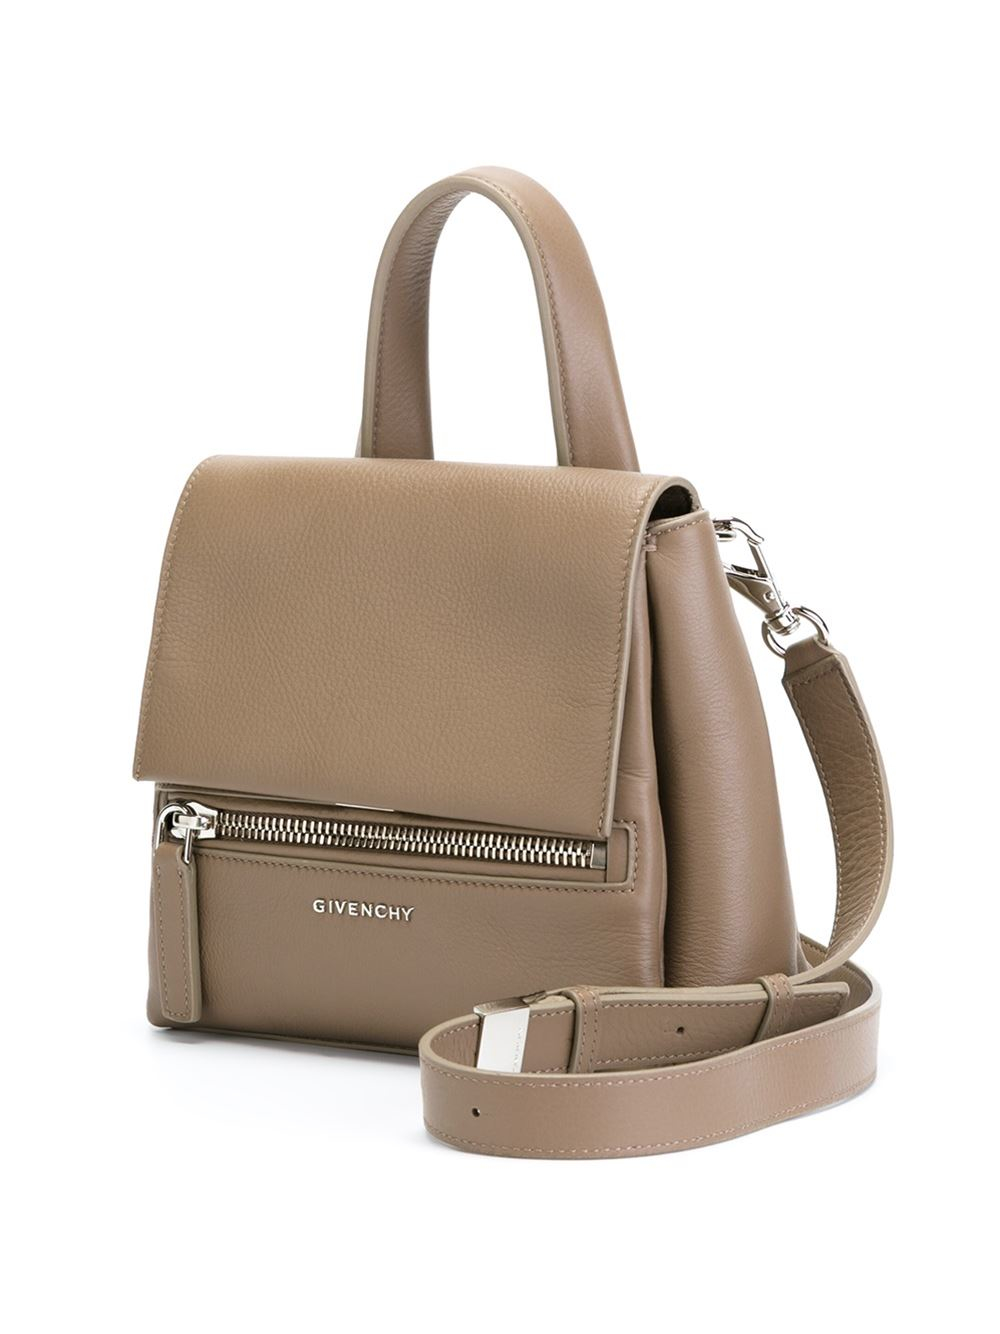 mini Pandora crossbody bag - Nude & Neutrals Givenchy UUUnltu